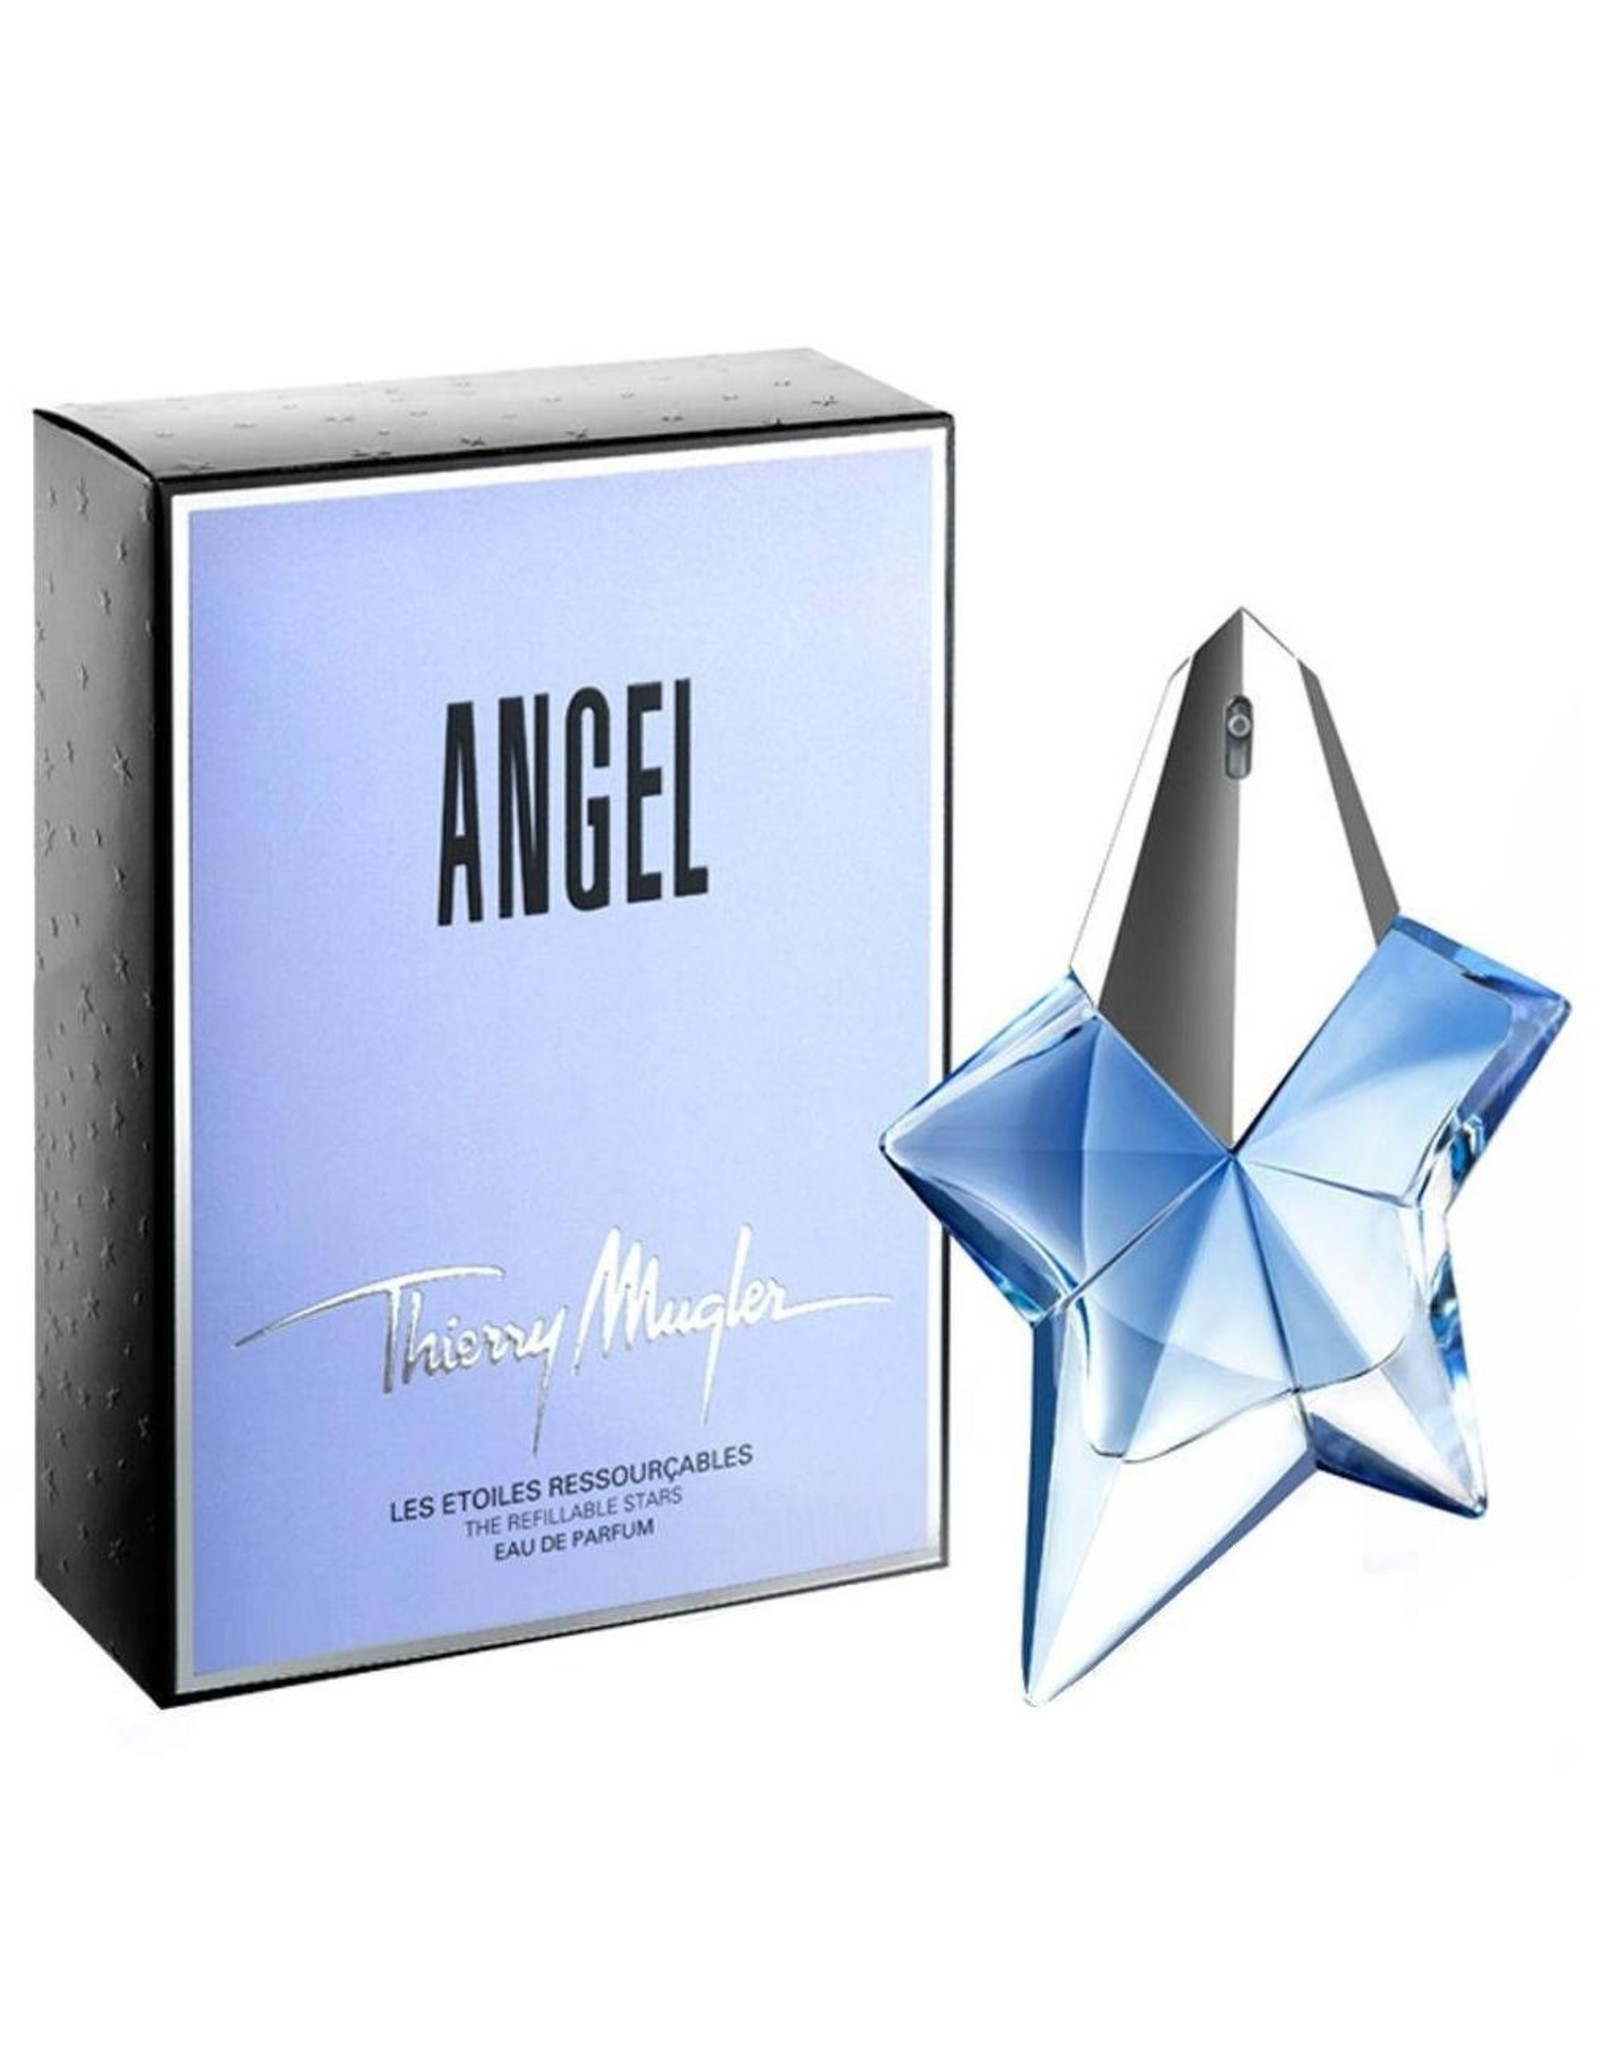 THIERRY MUGLER THIERRY MUGLER ANGEL